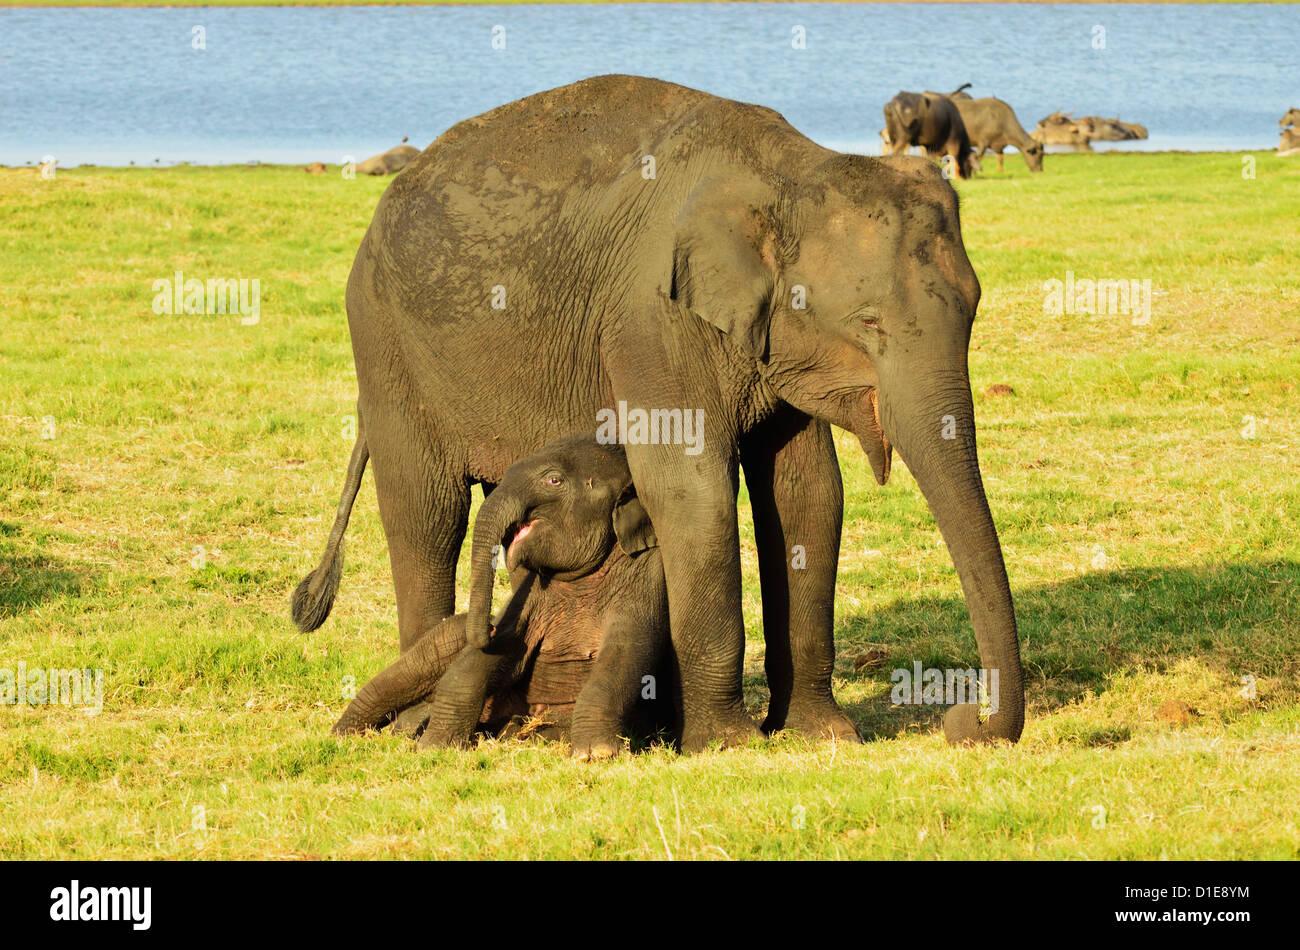 Sri Lankan elephant (Elephas maximus maximus), Minneriya National Park, Sri Lanka, Asia - Stock Image